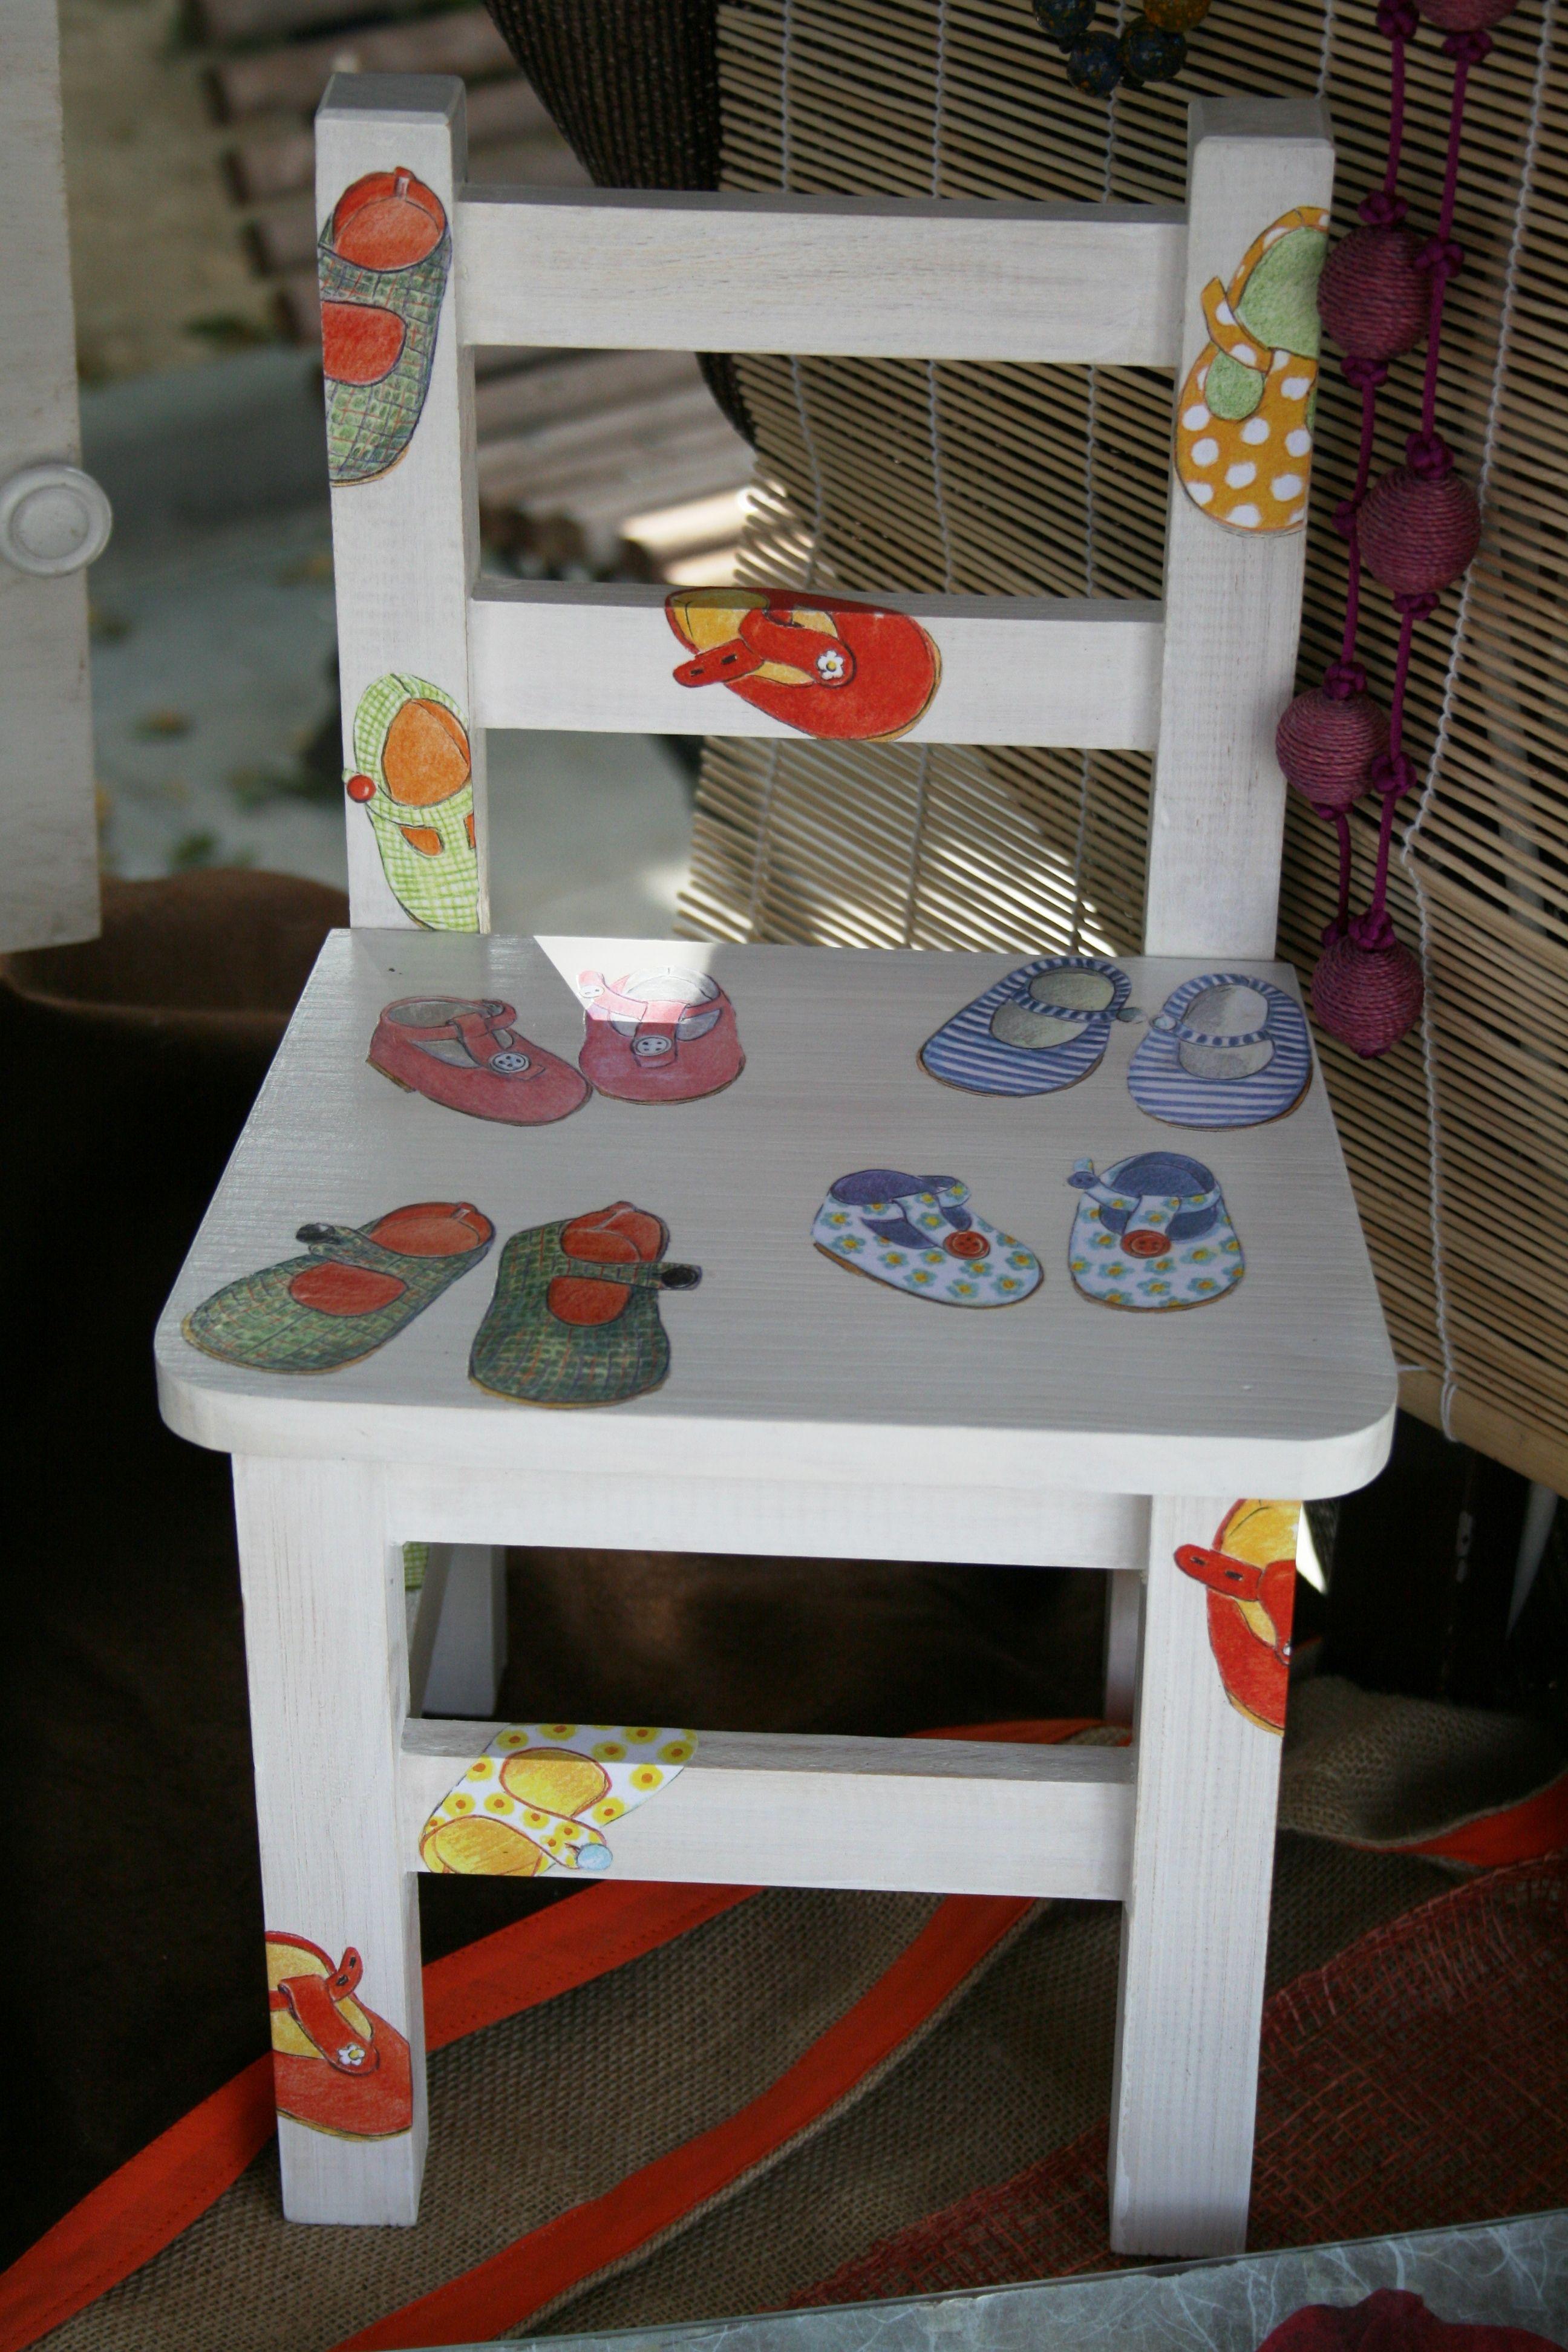 Silla infantil pintura decorativa pint pinterest - Sillas infantiles ...